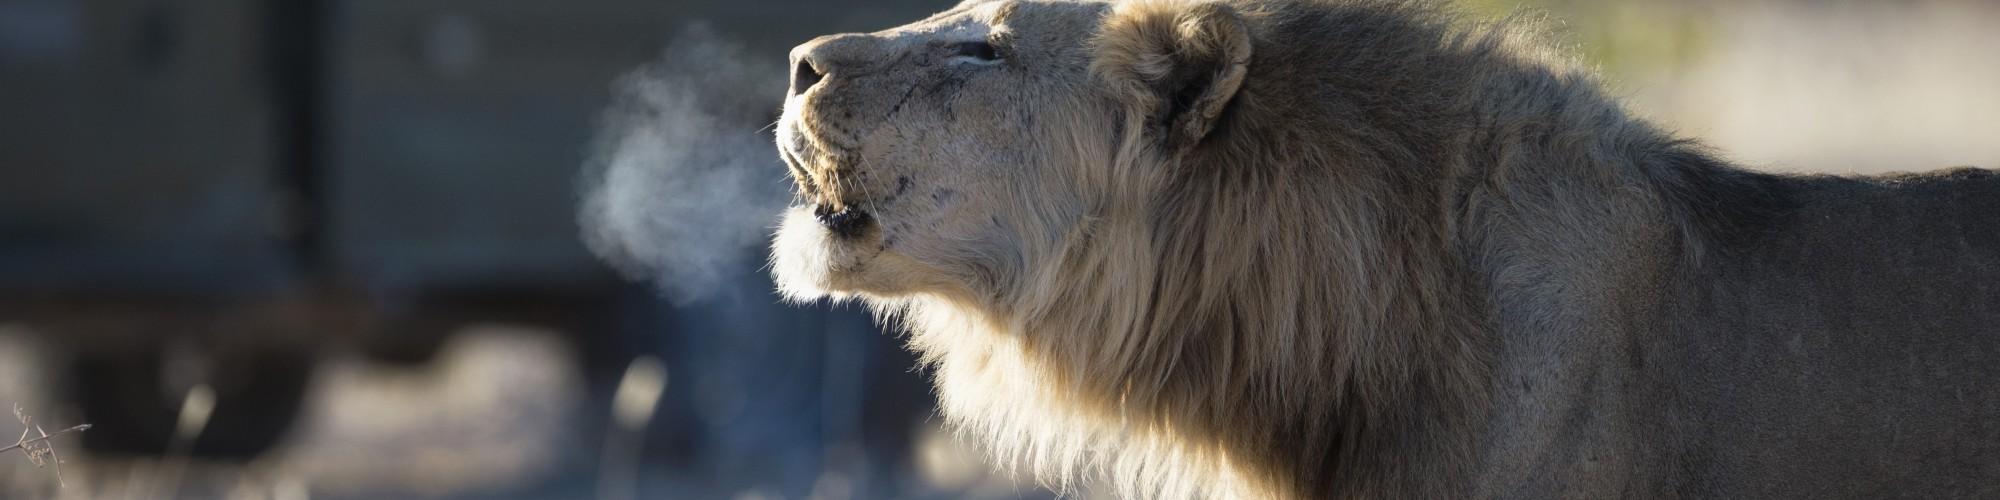 ongava lion